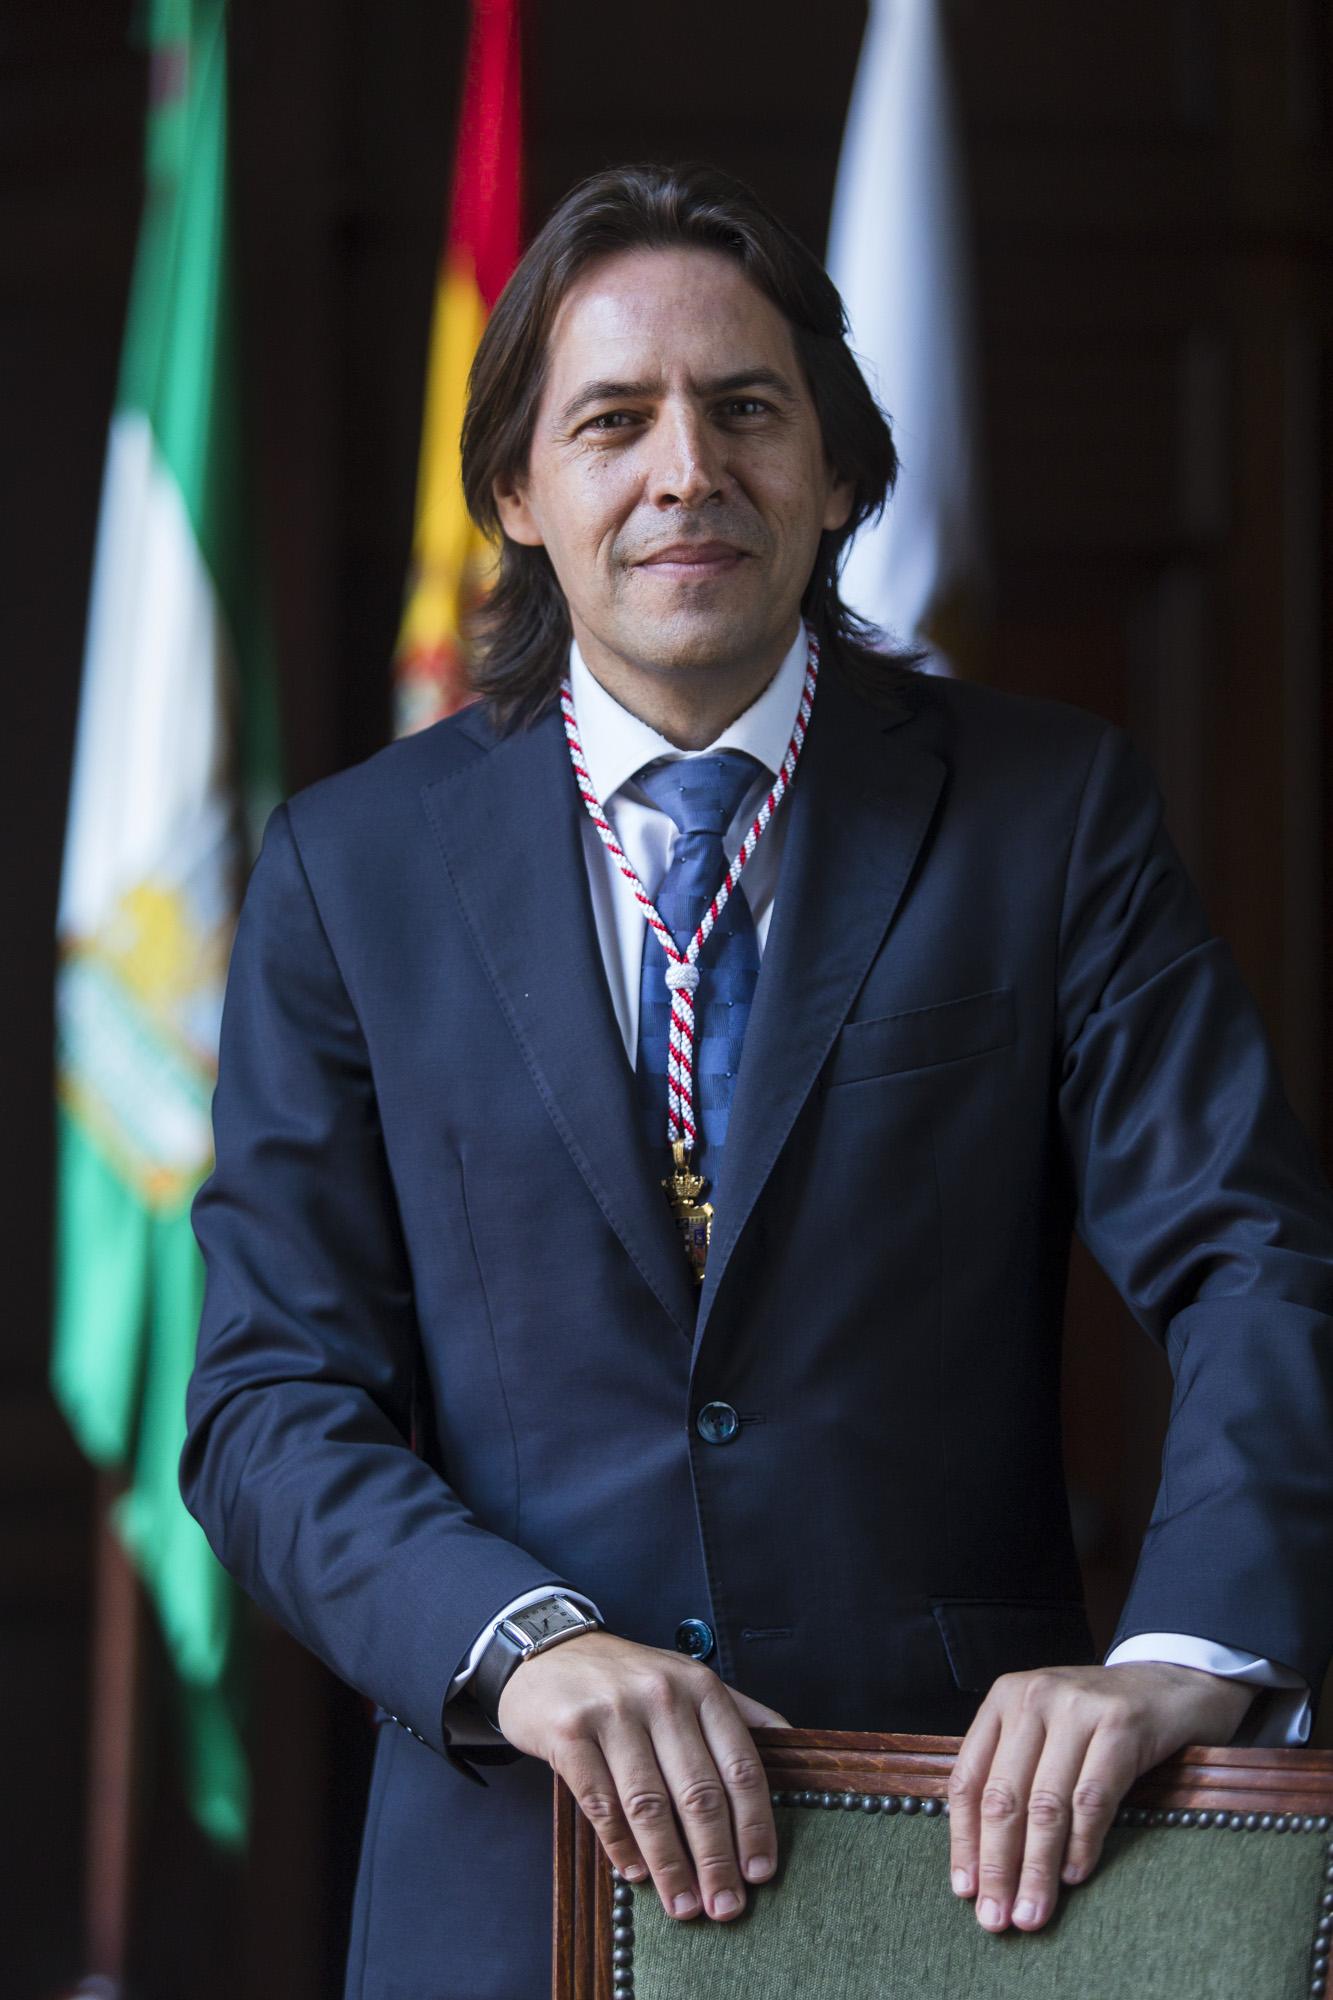 Rafael Jesús Burgos Castelo